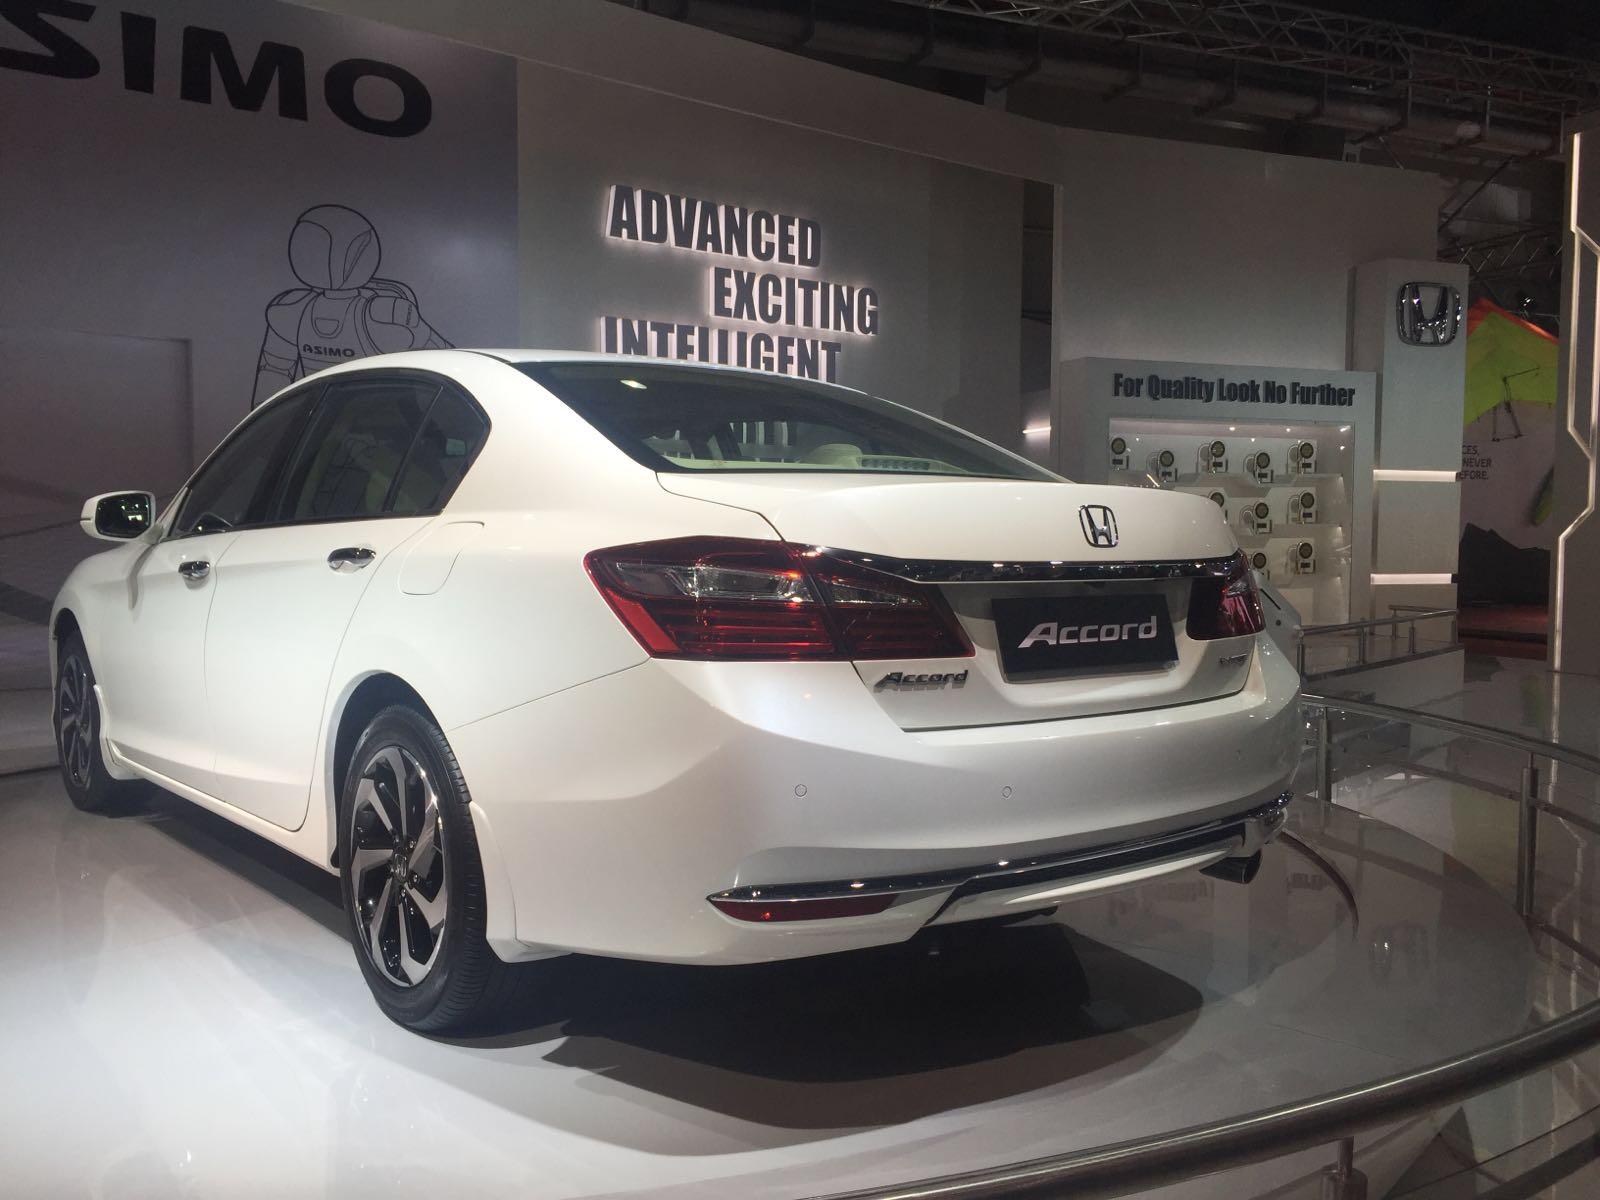 New honda accord 2016 india price 37 lakh specs for Honda accord models